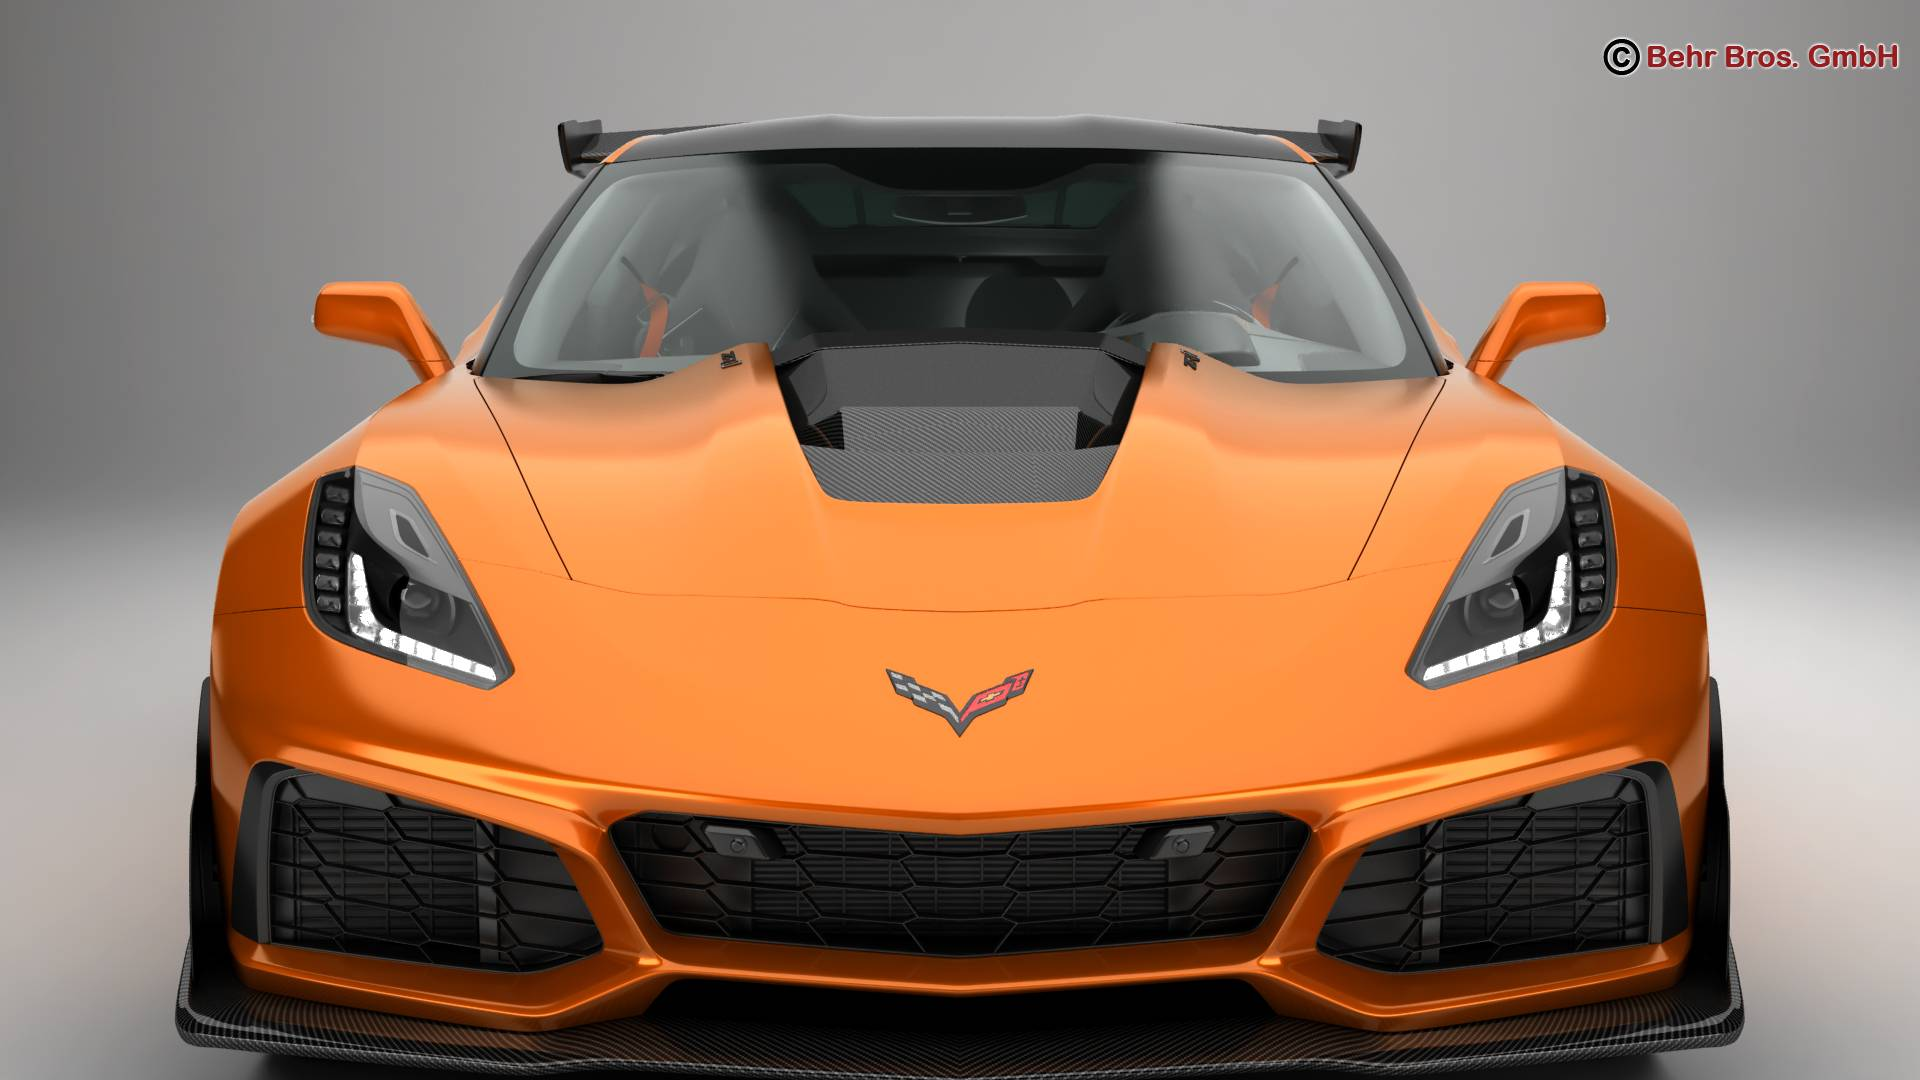 chevrolet corvette zr1 2019 3d model 3ds max fbx c4d lwo ma mb obj 275972